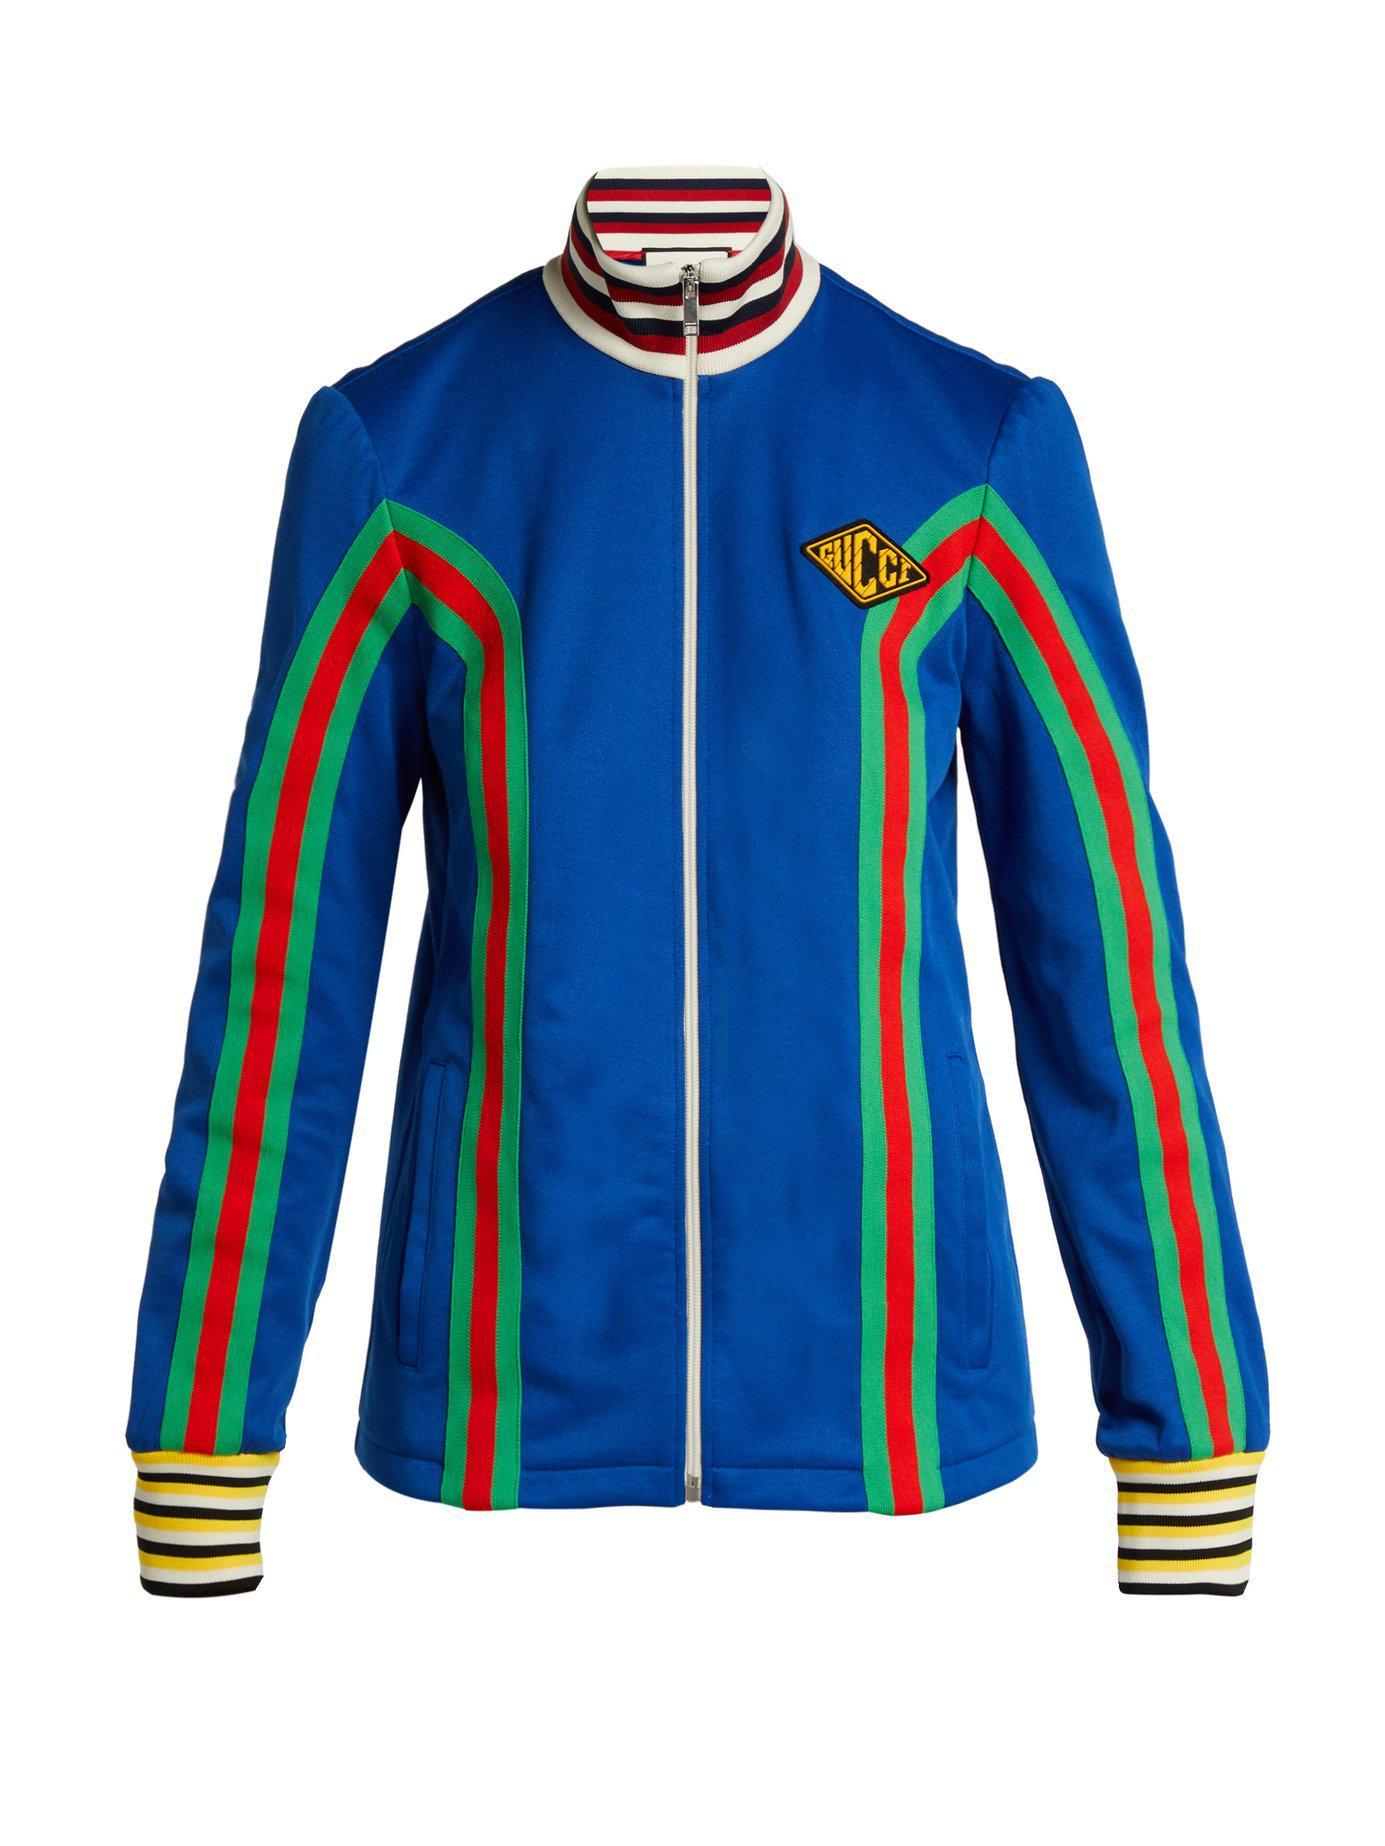 a06bd481b11 Lyst - Gucci Logo Embellished Stretch Cotton Track Jacket in Blue